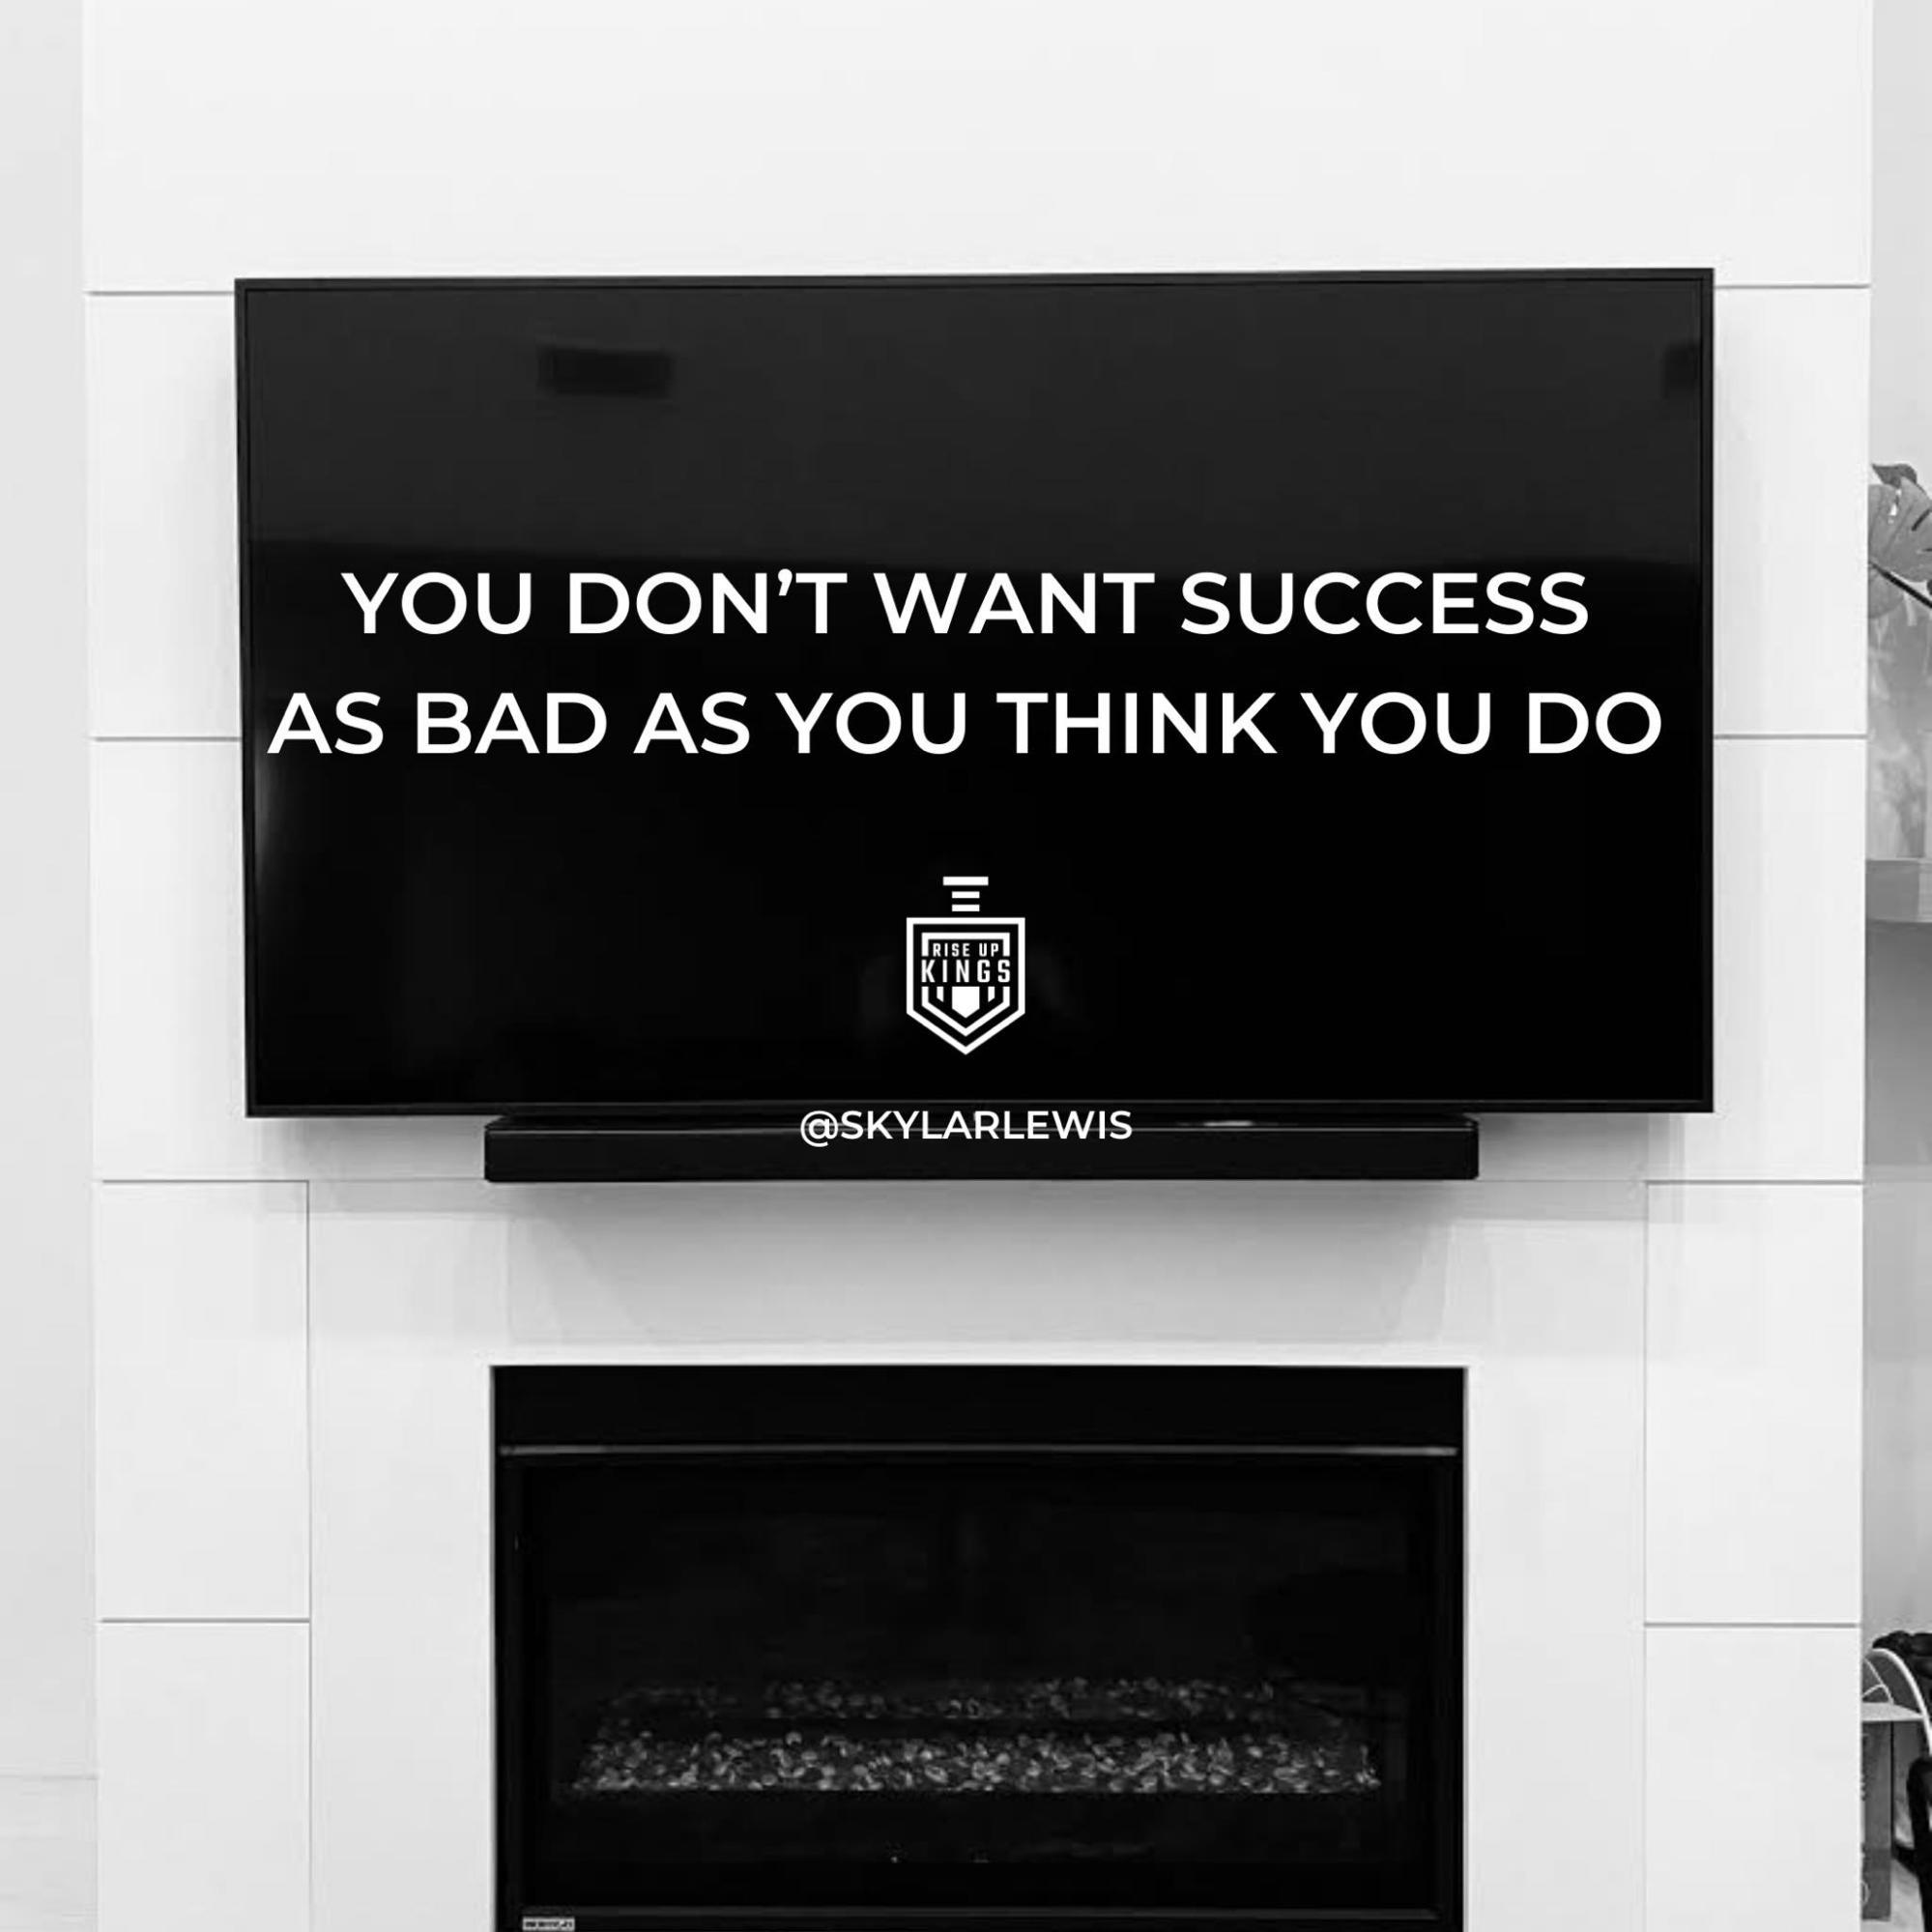 Stop the habit that isn't creating success